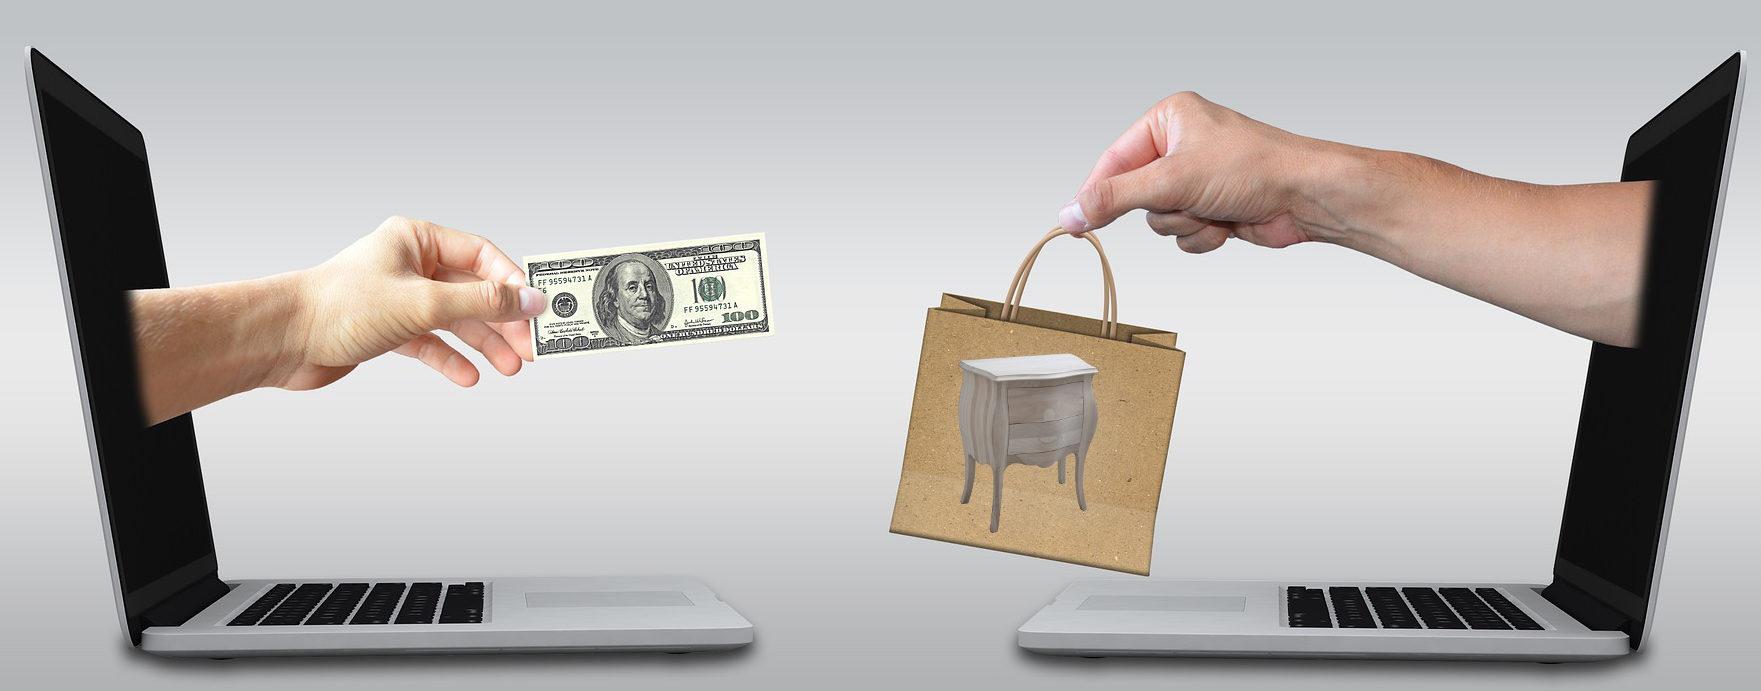 Pratelli mobili vendita online mobili grezzi e for Outlet mobili online vendita